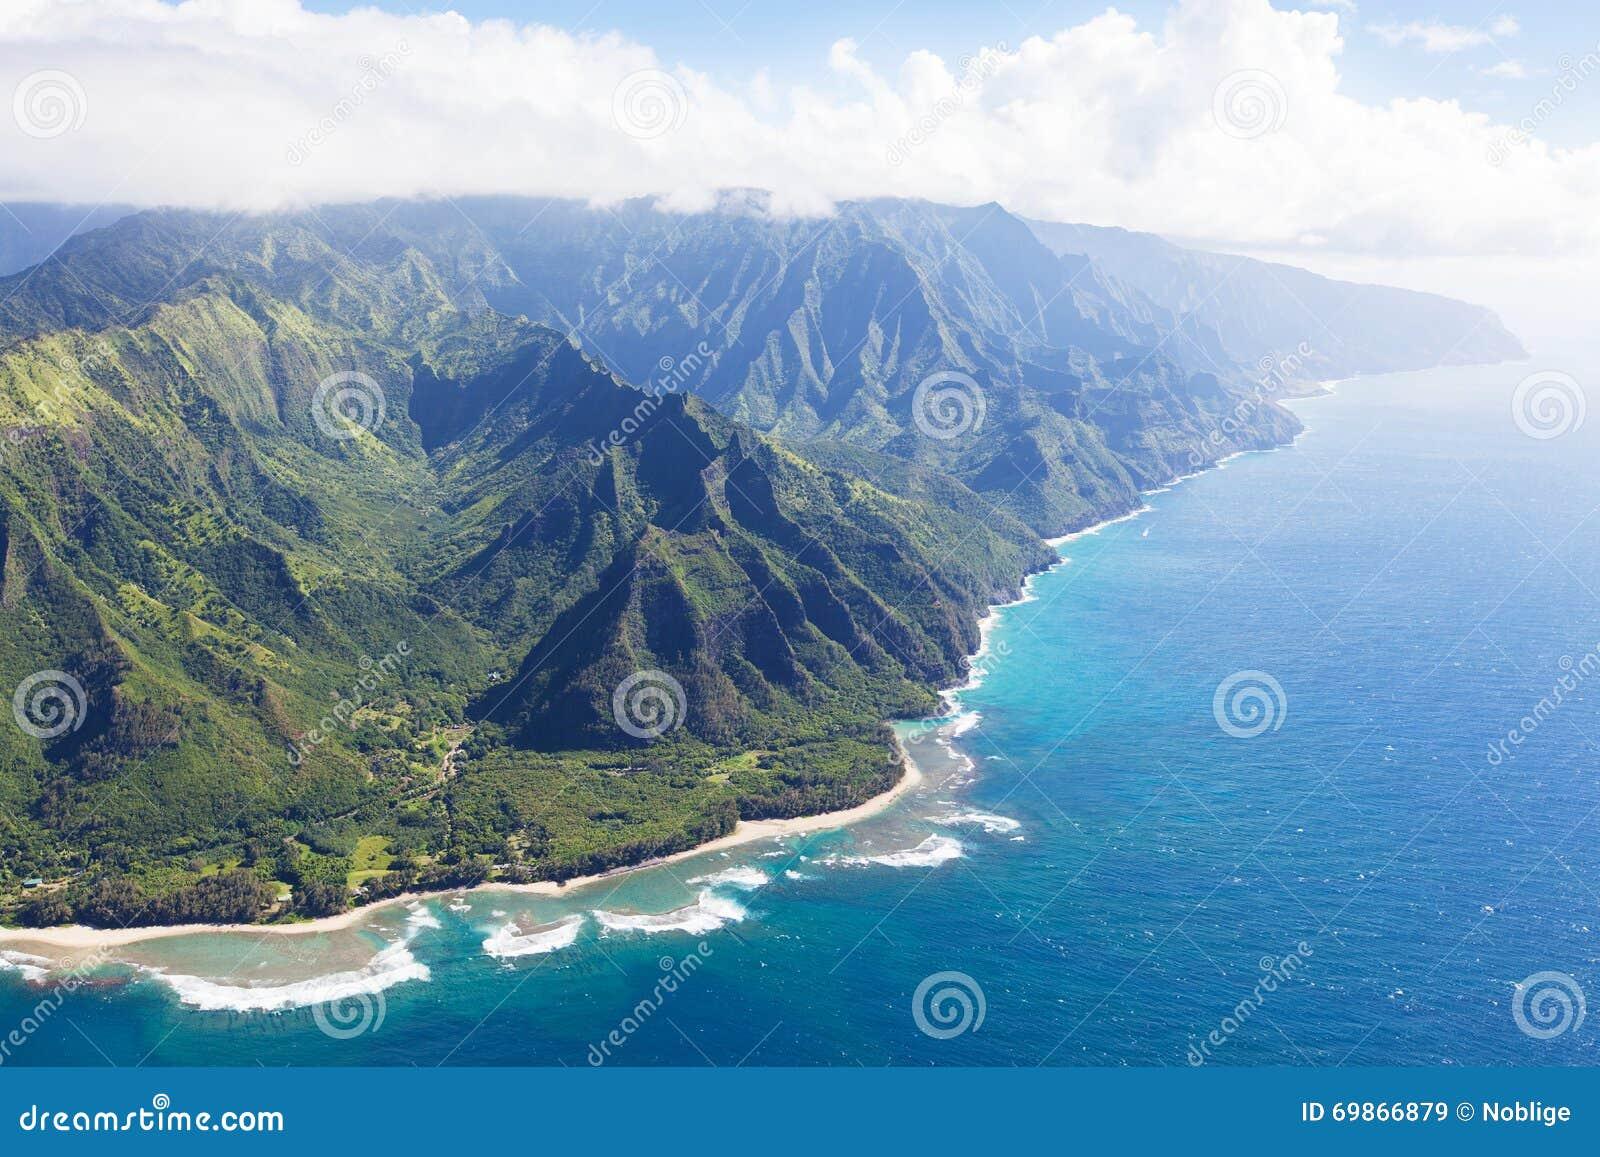 Na pali coast at kauai